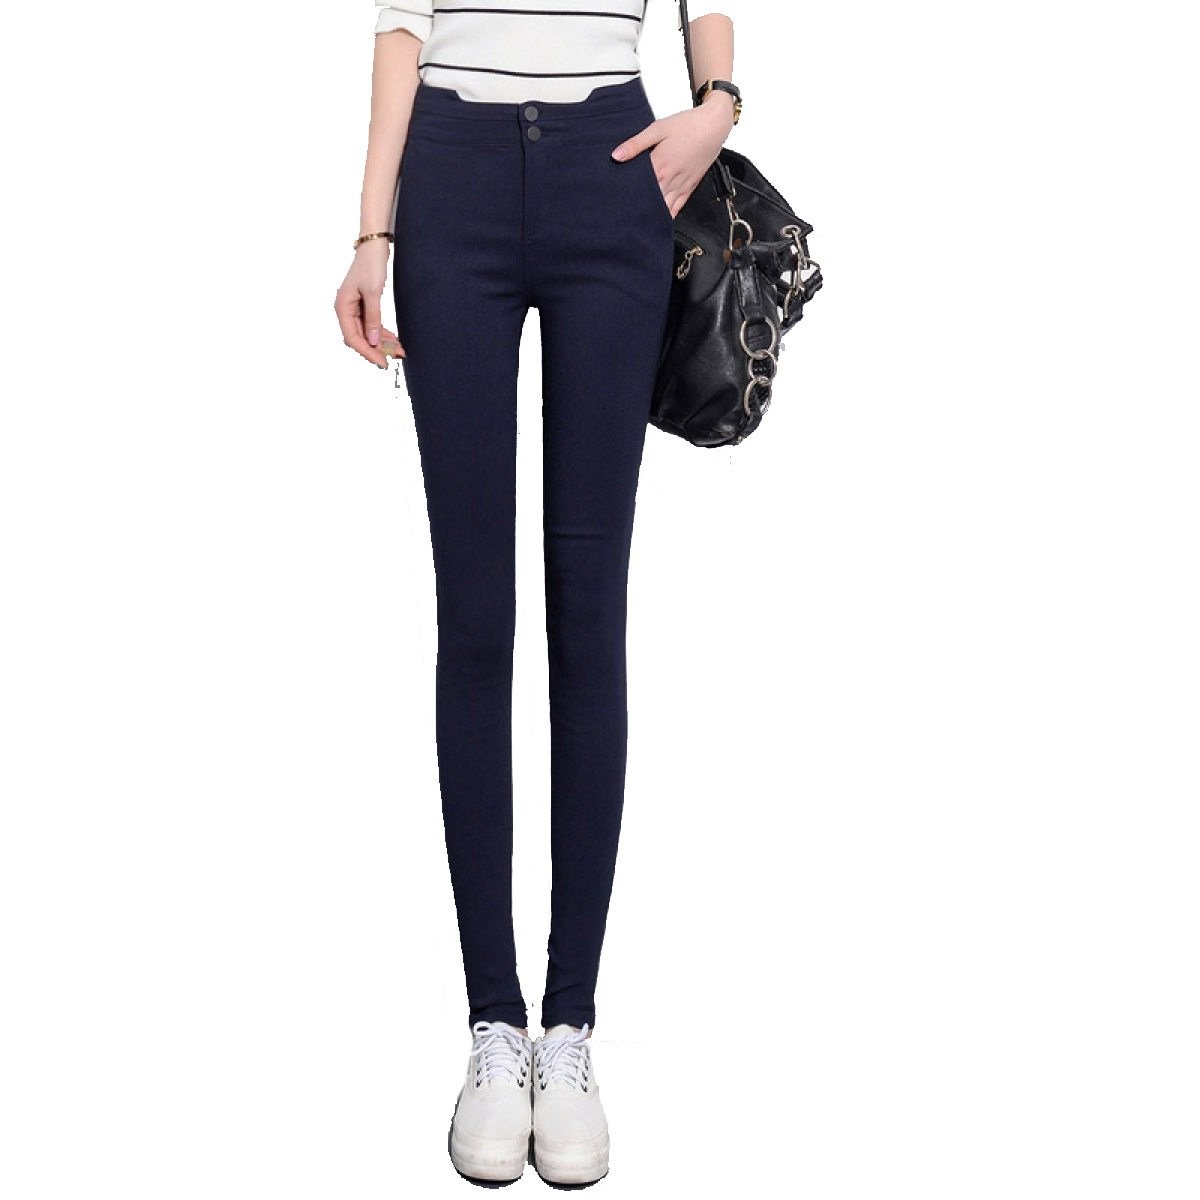 Darkbleu 3XL snfgoij Collants pour Les Les dames Pantalons Leggings Pantalons Tight noir Buckle Taille Waichuan Stretch Pants Pantalons